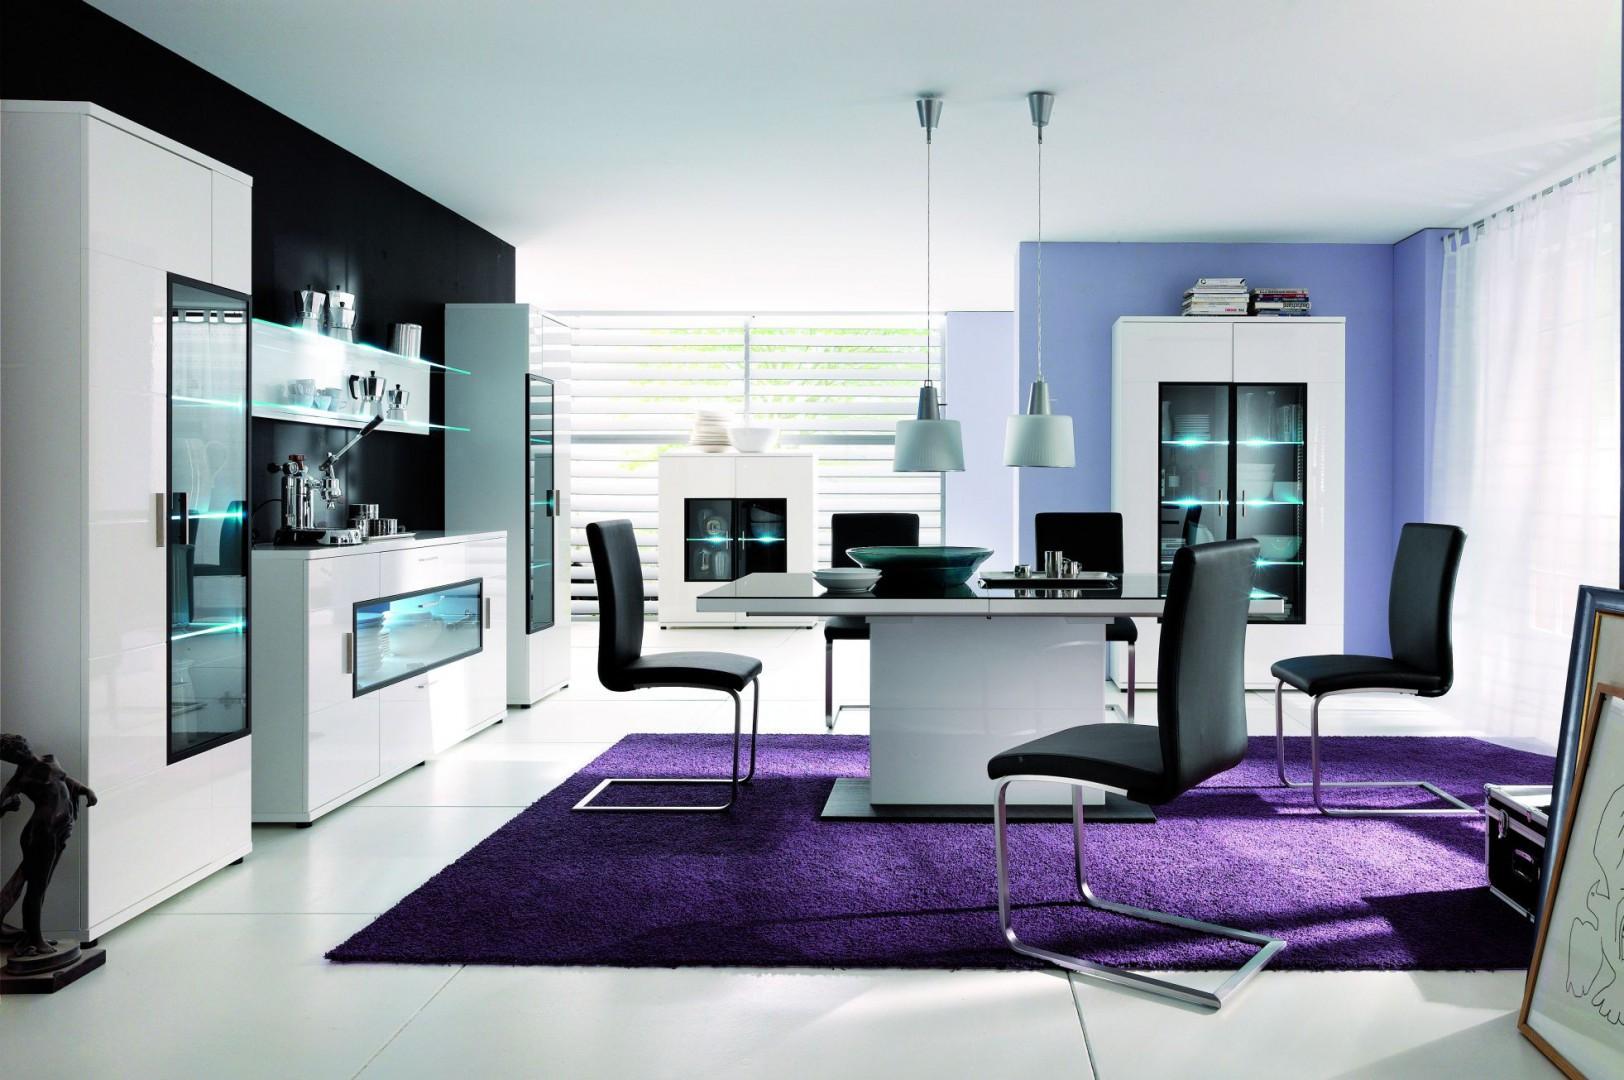 wybieramy meble bia e meble nowoczesne propozycje do salonu. Black Bedroom Furniture Sets. Home Design Ideas